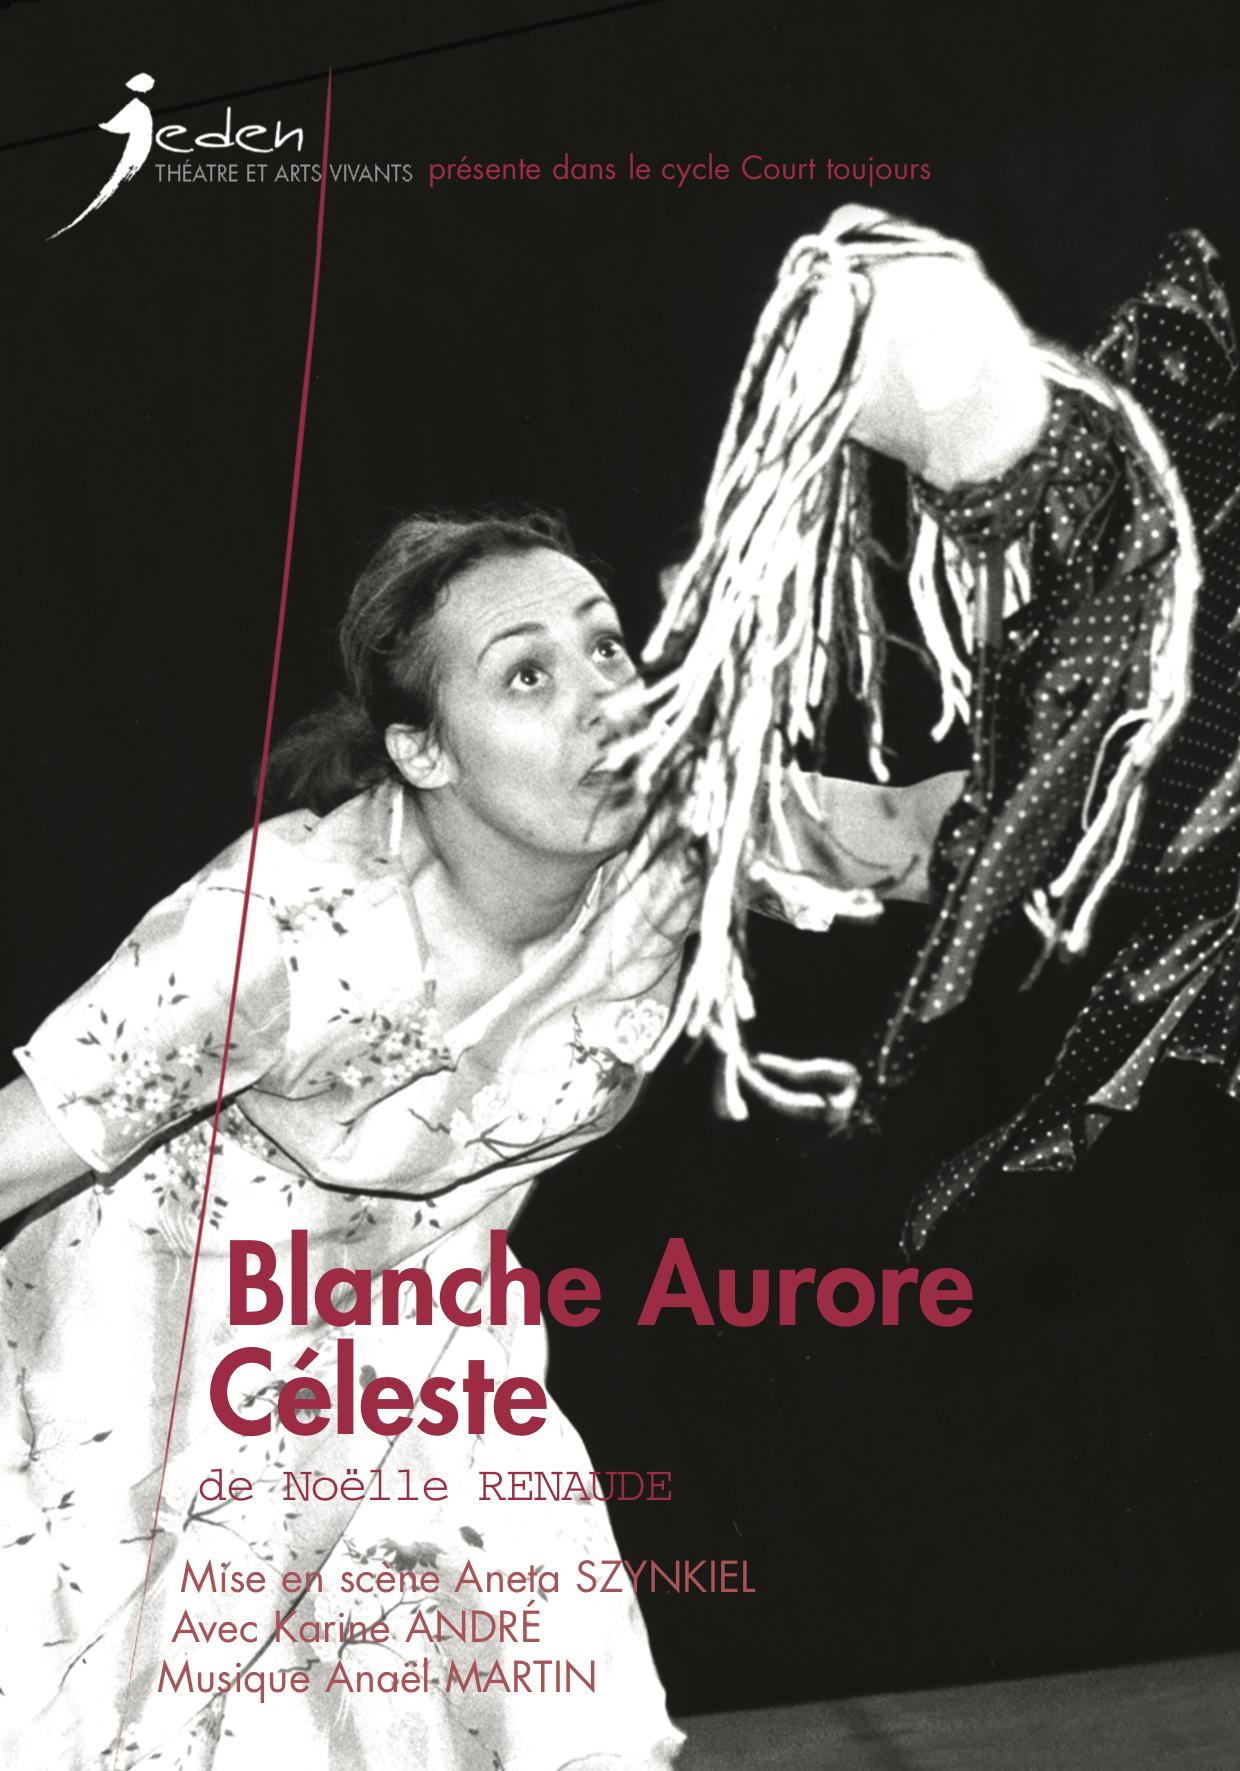 Blanche Aurore Céleste